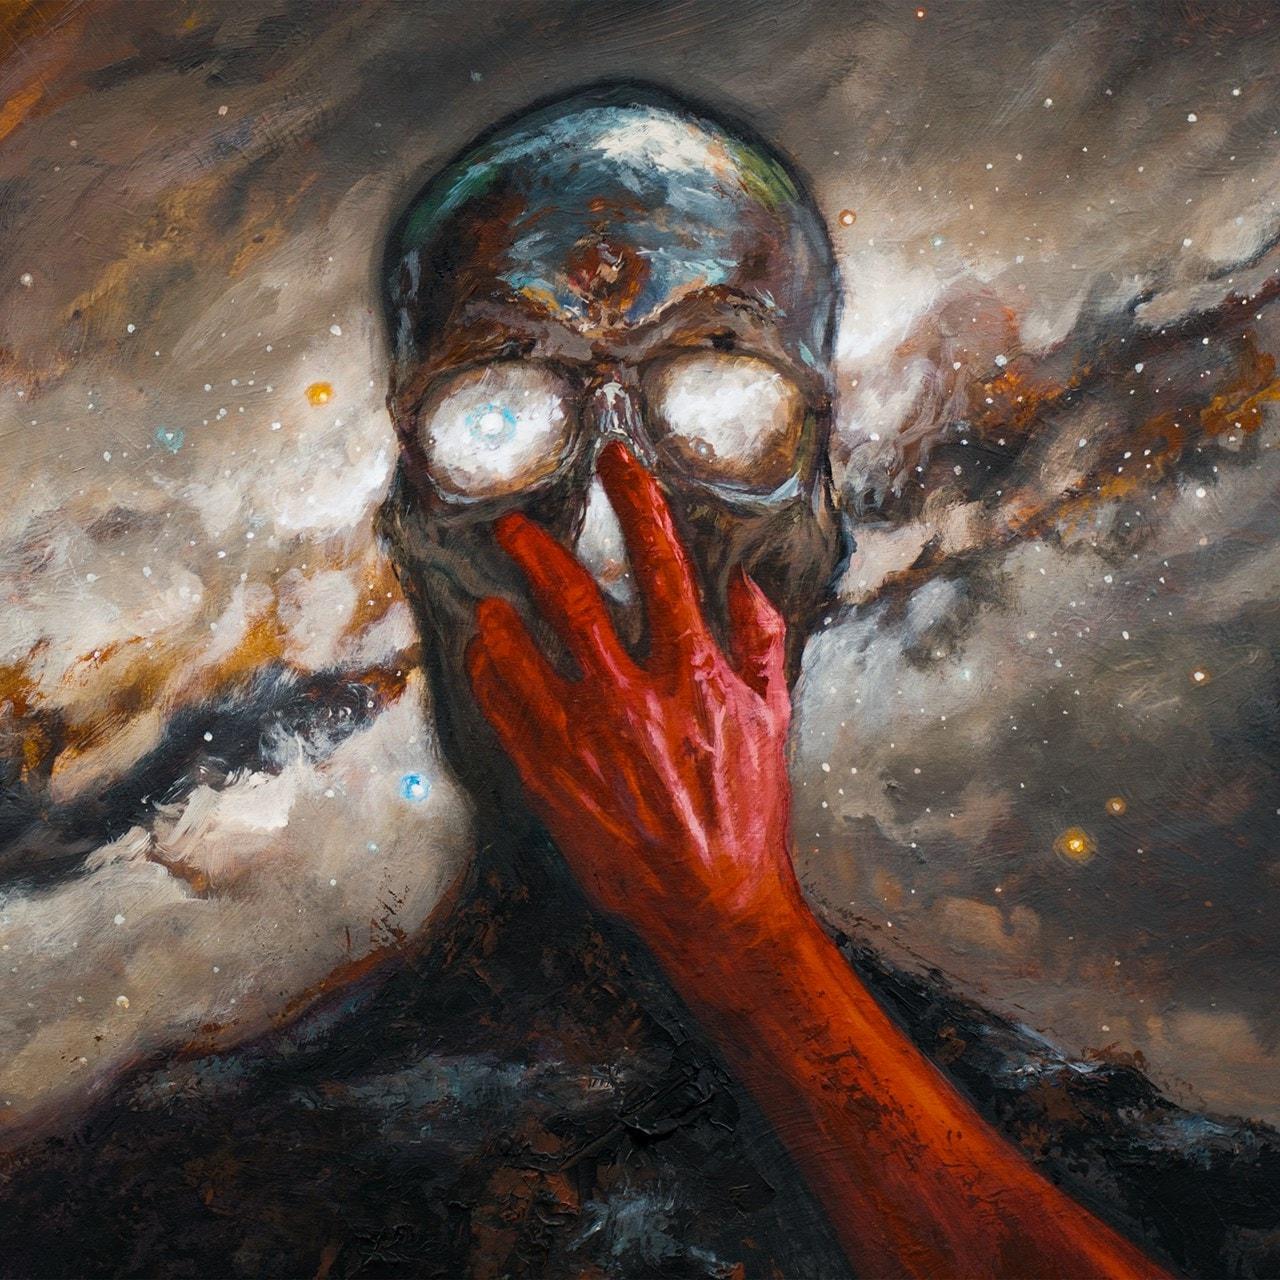 Bury Tomorrow - Cannibal - Picture Disc LP & hmv Vault Birmingham Event Entry - 1